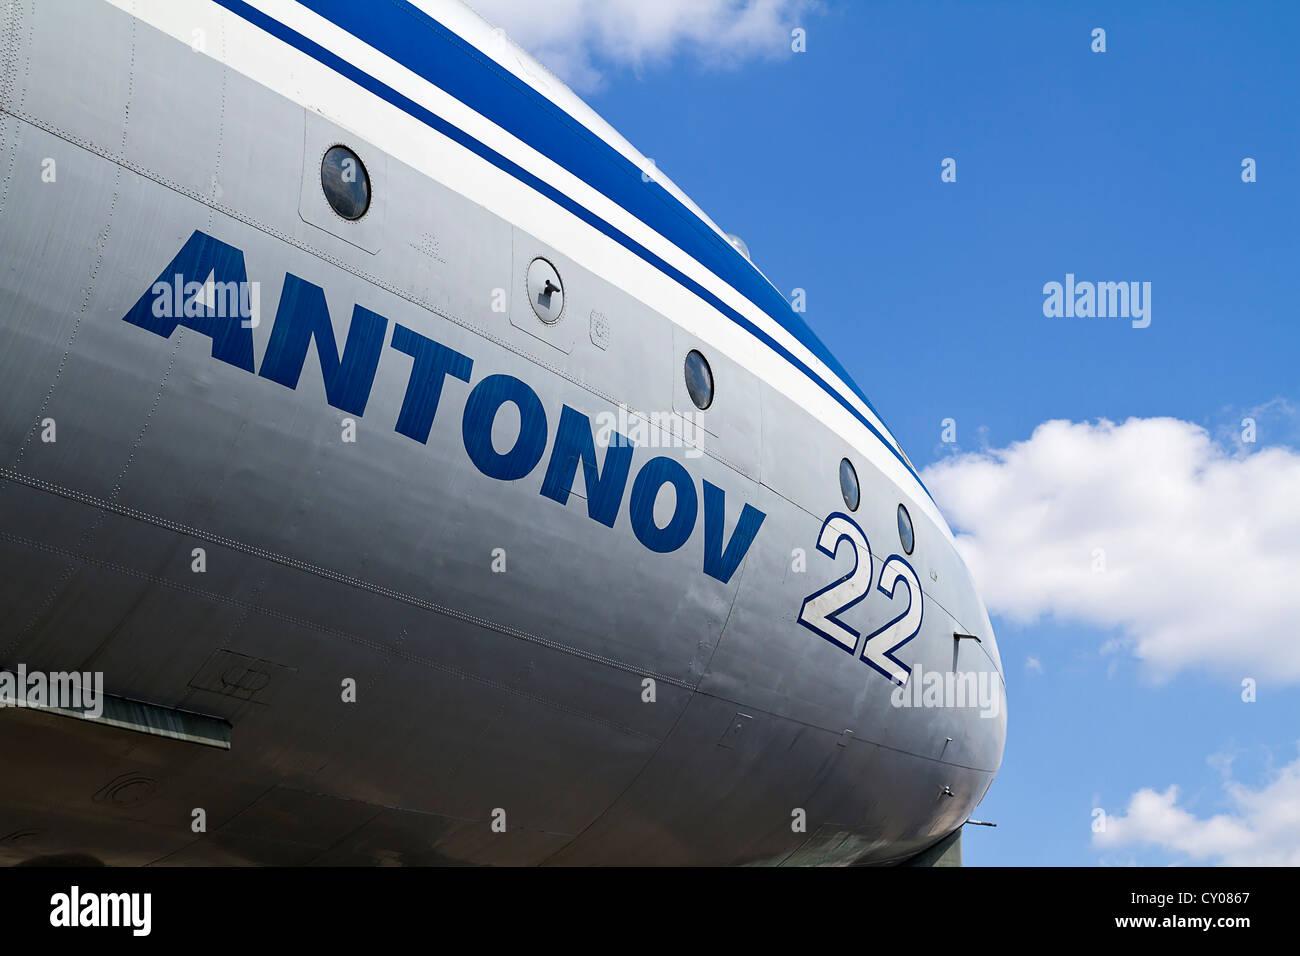 Antonov 22 - Stock Image